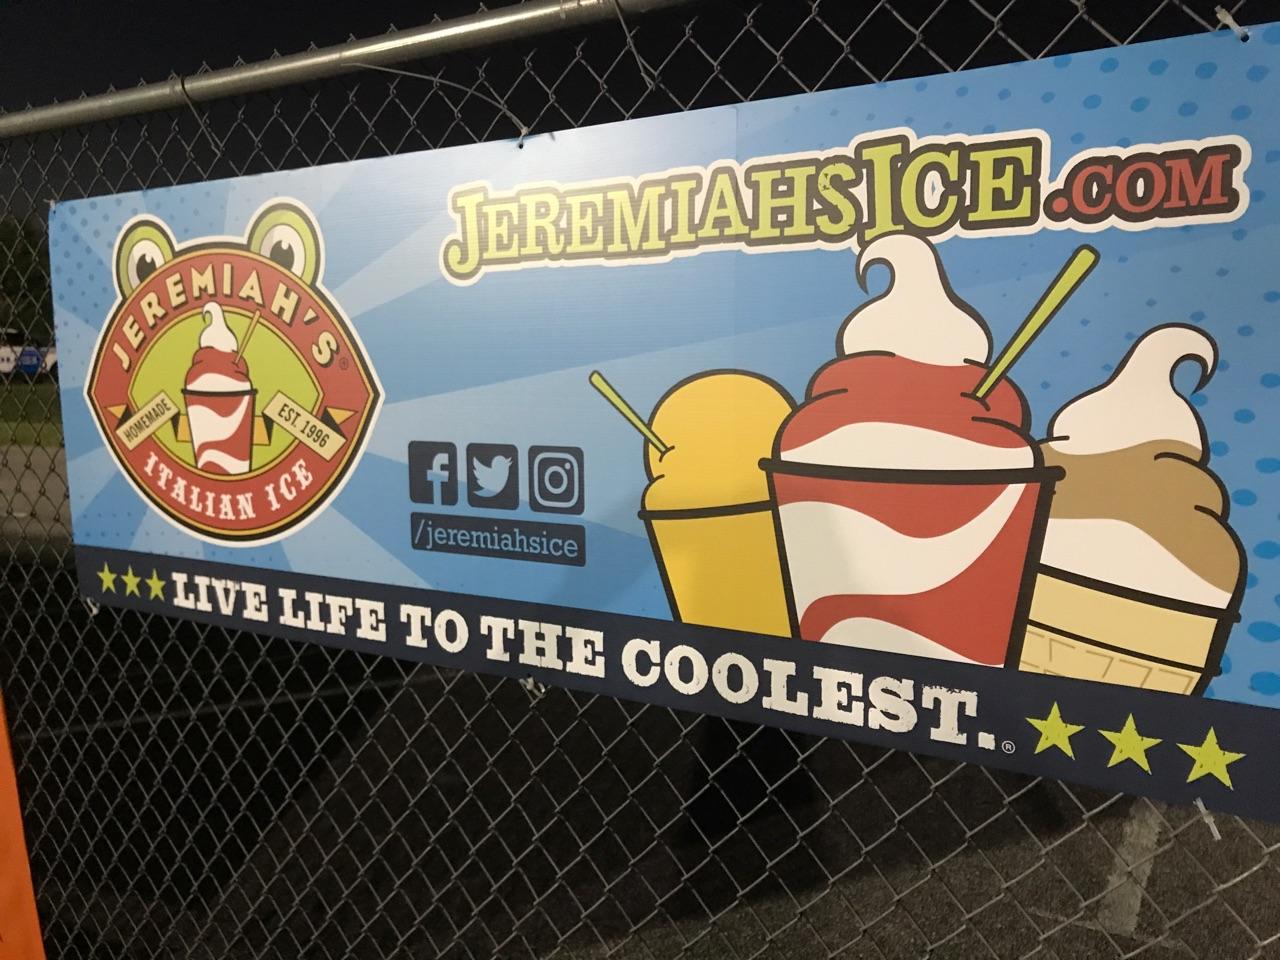 Jeremiahs supports OCPS